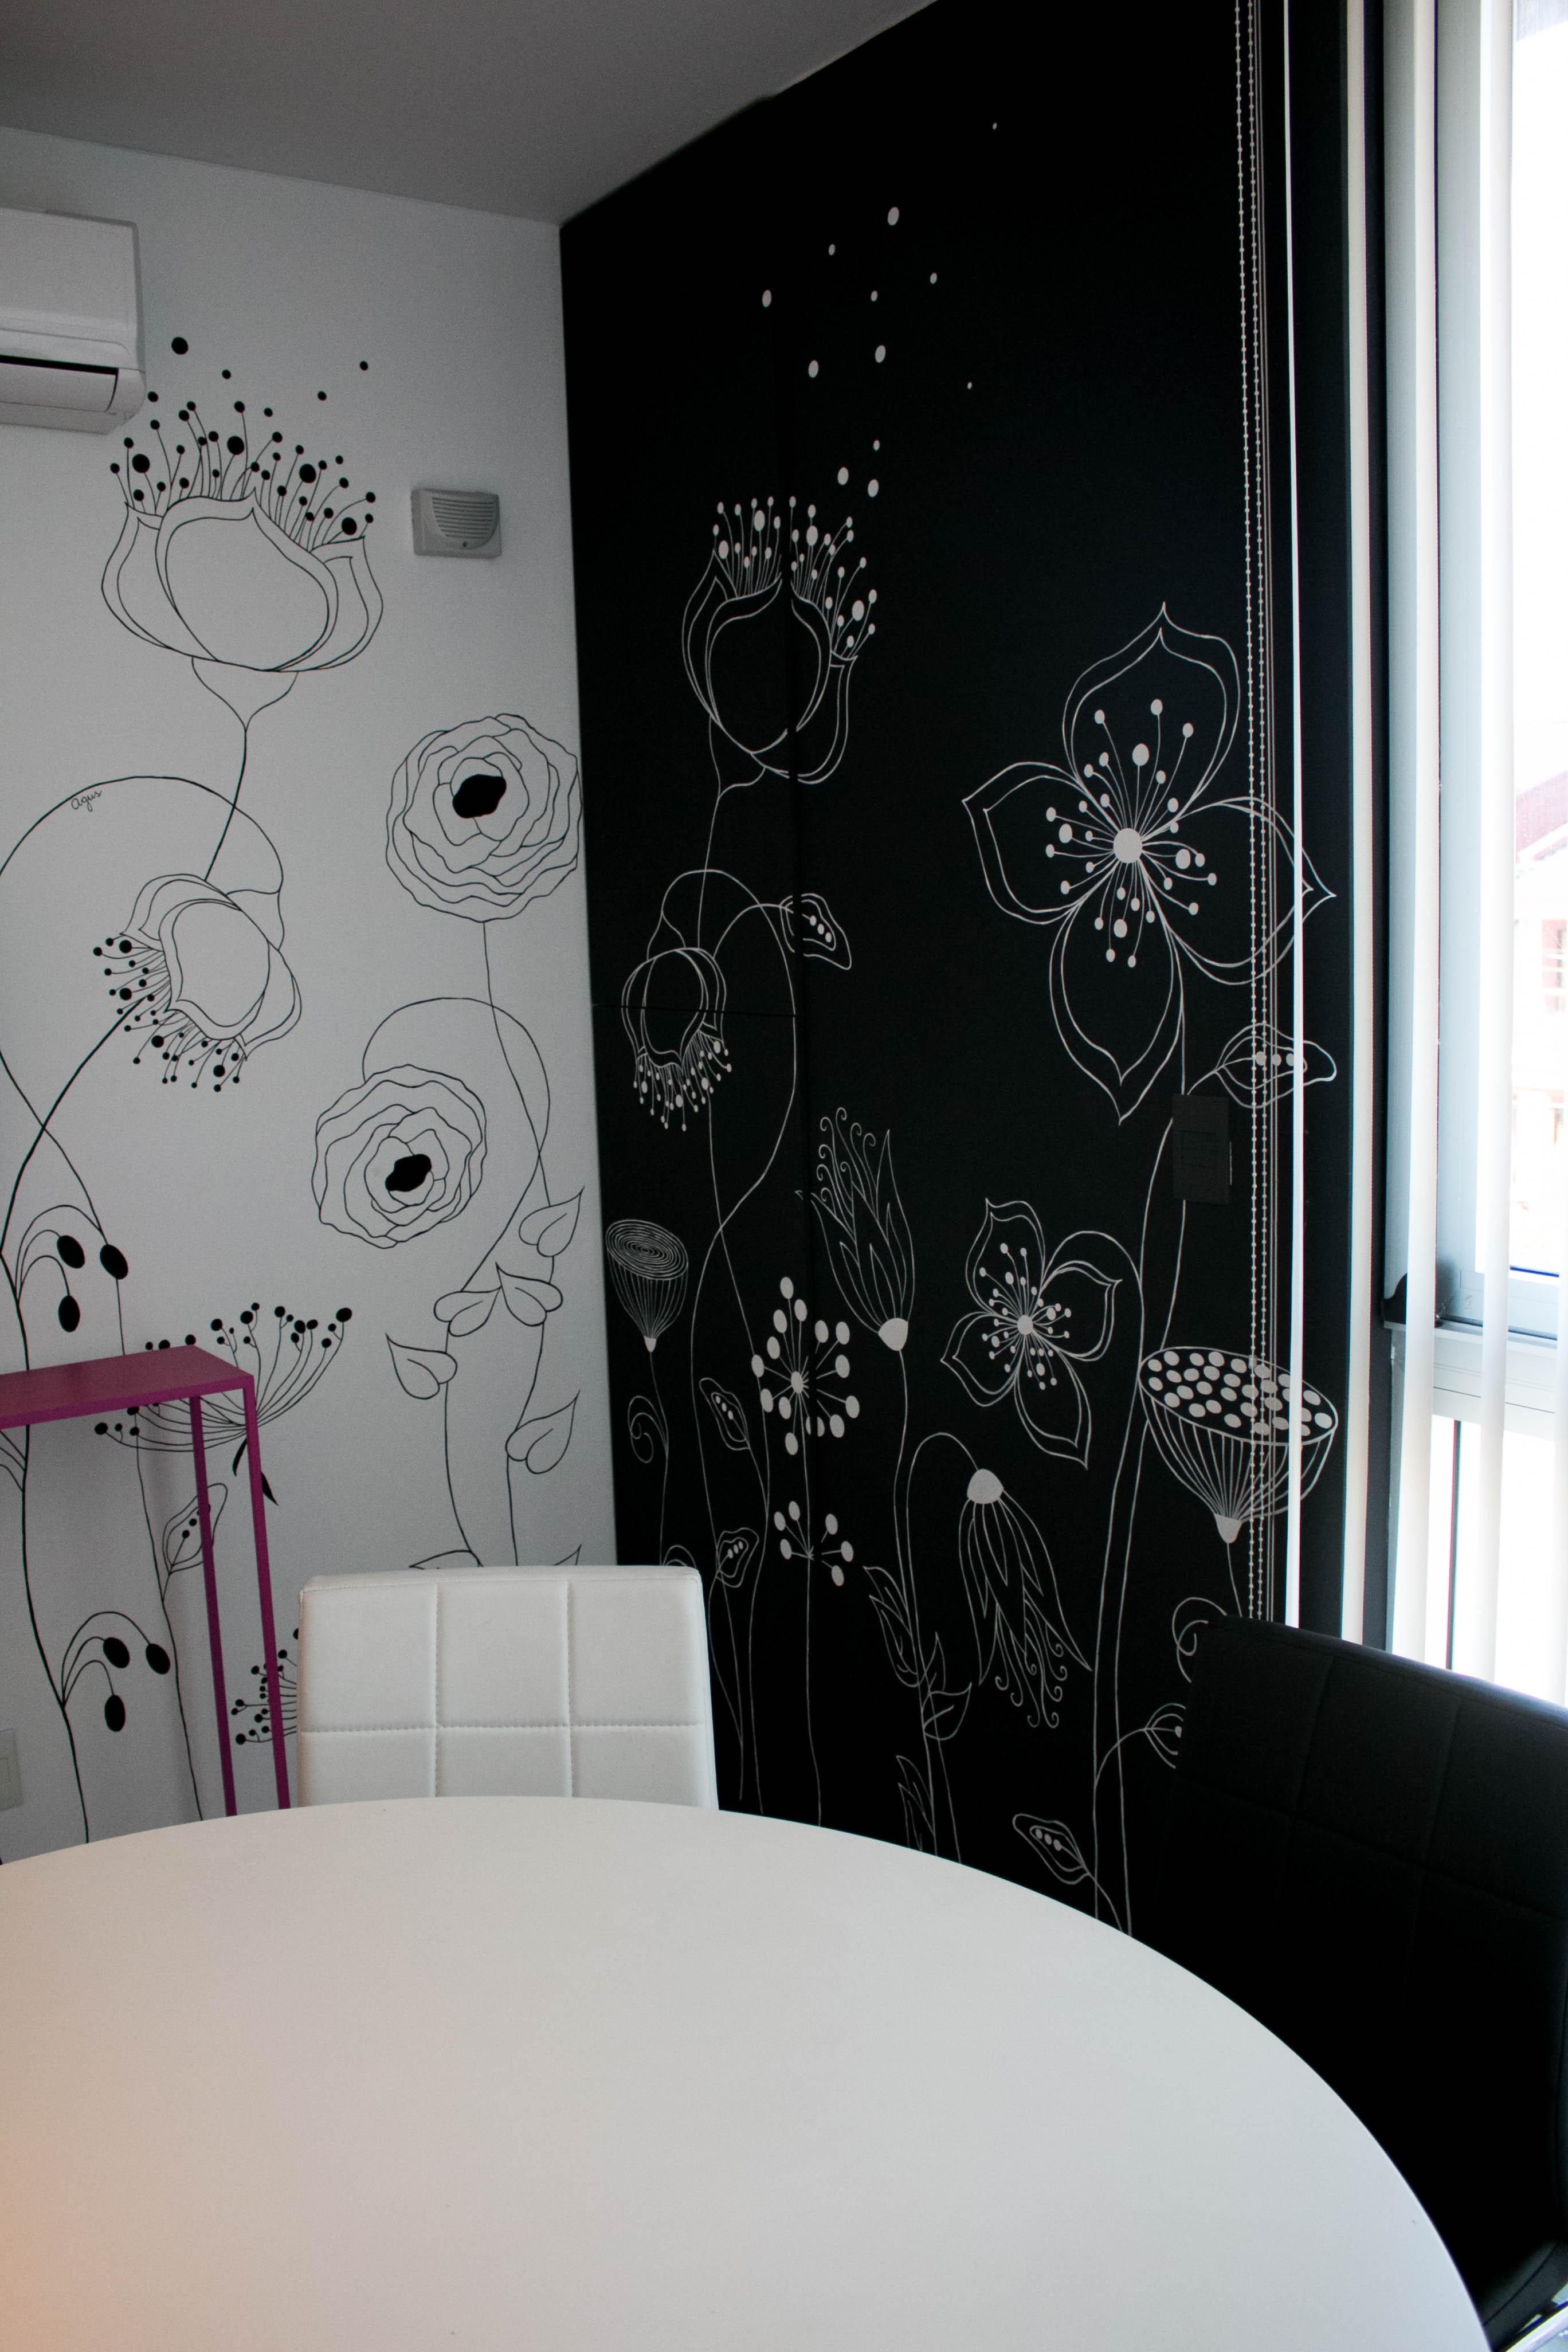 Arquitecta e interiorista romina calziwww.rominacalzi.com calzi